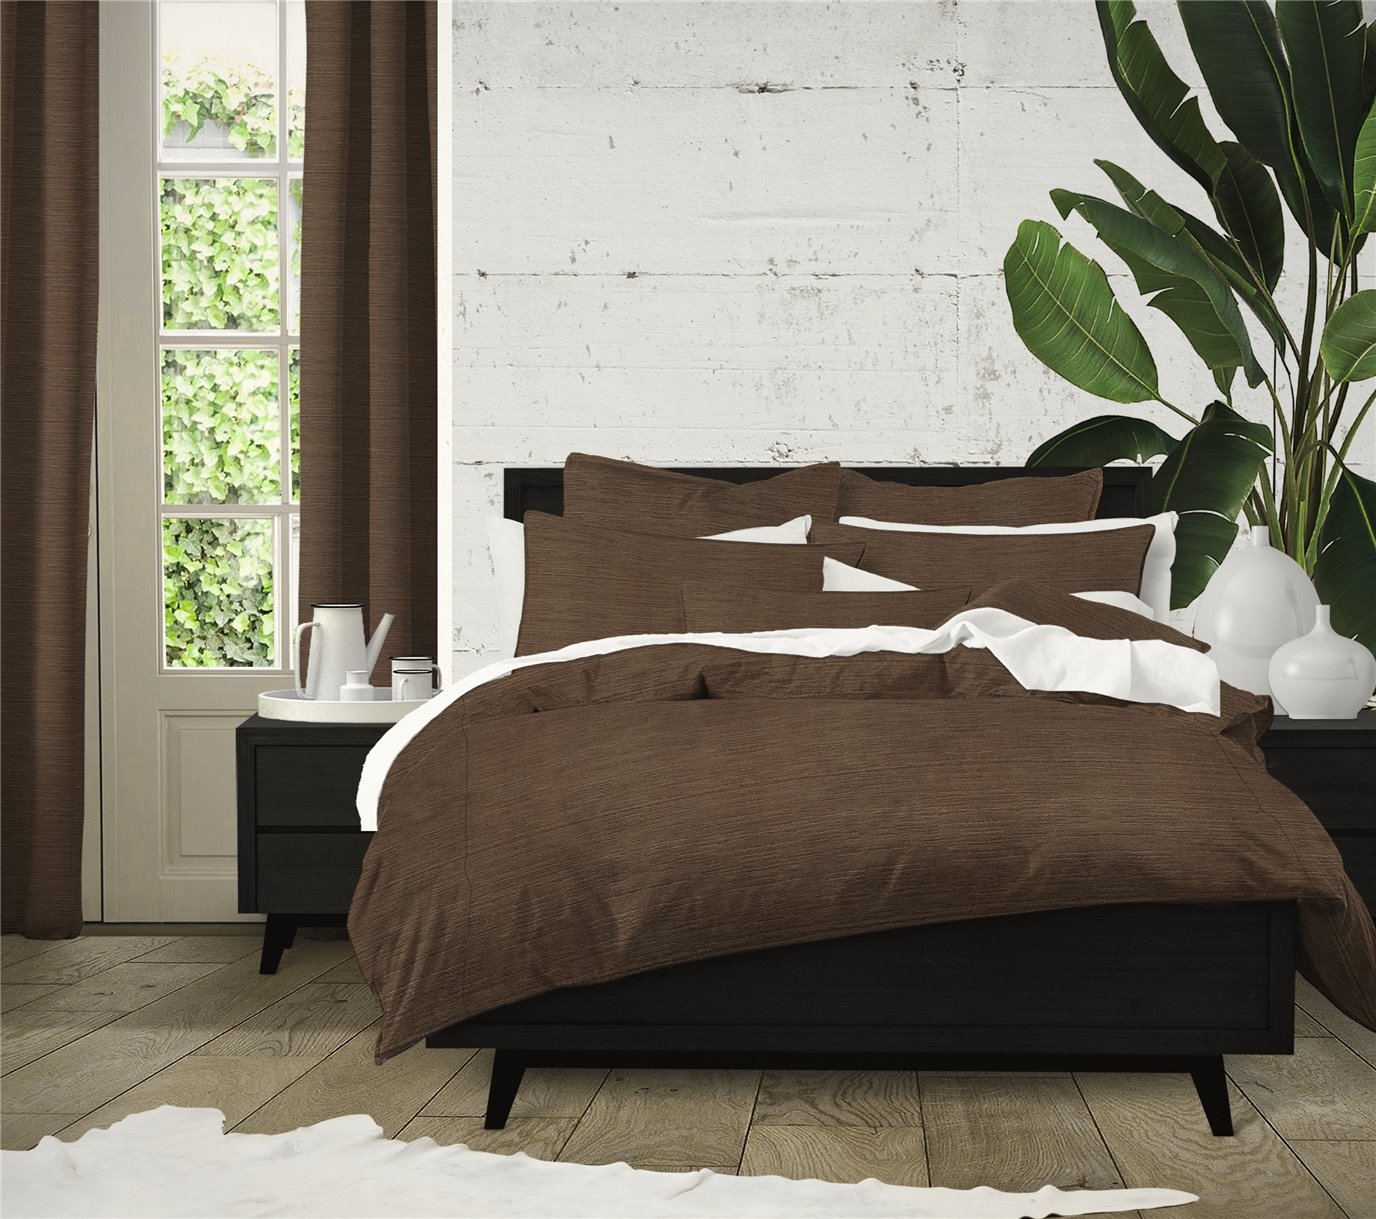 McGregor Chocolate Comforter Set - King